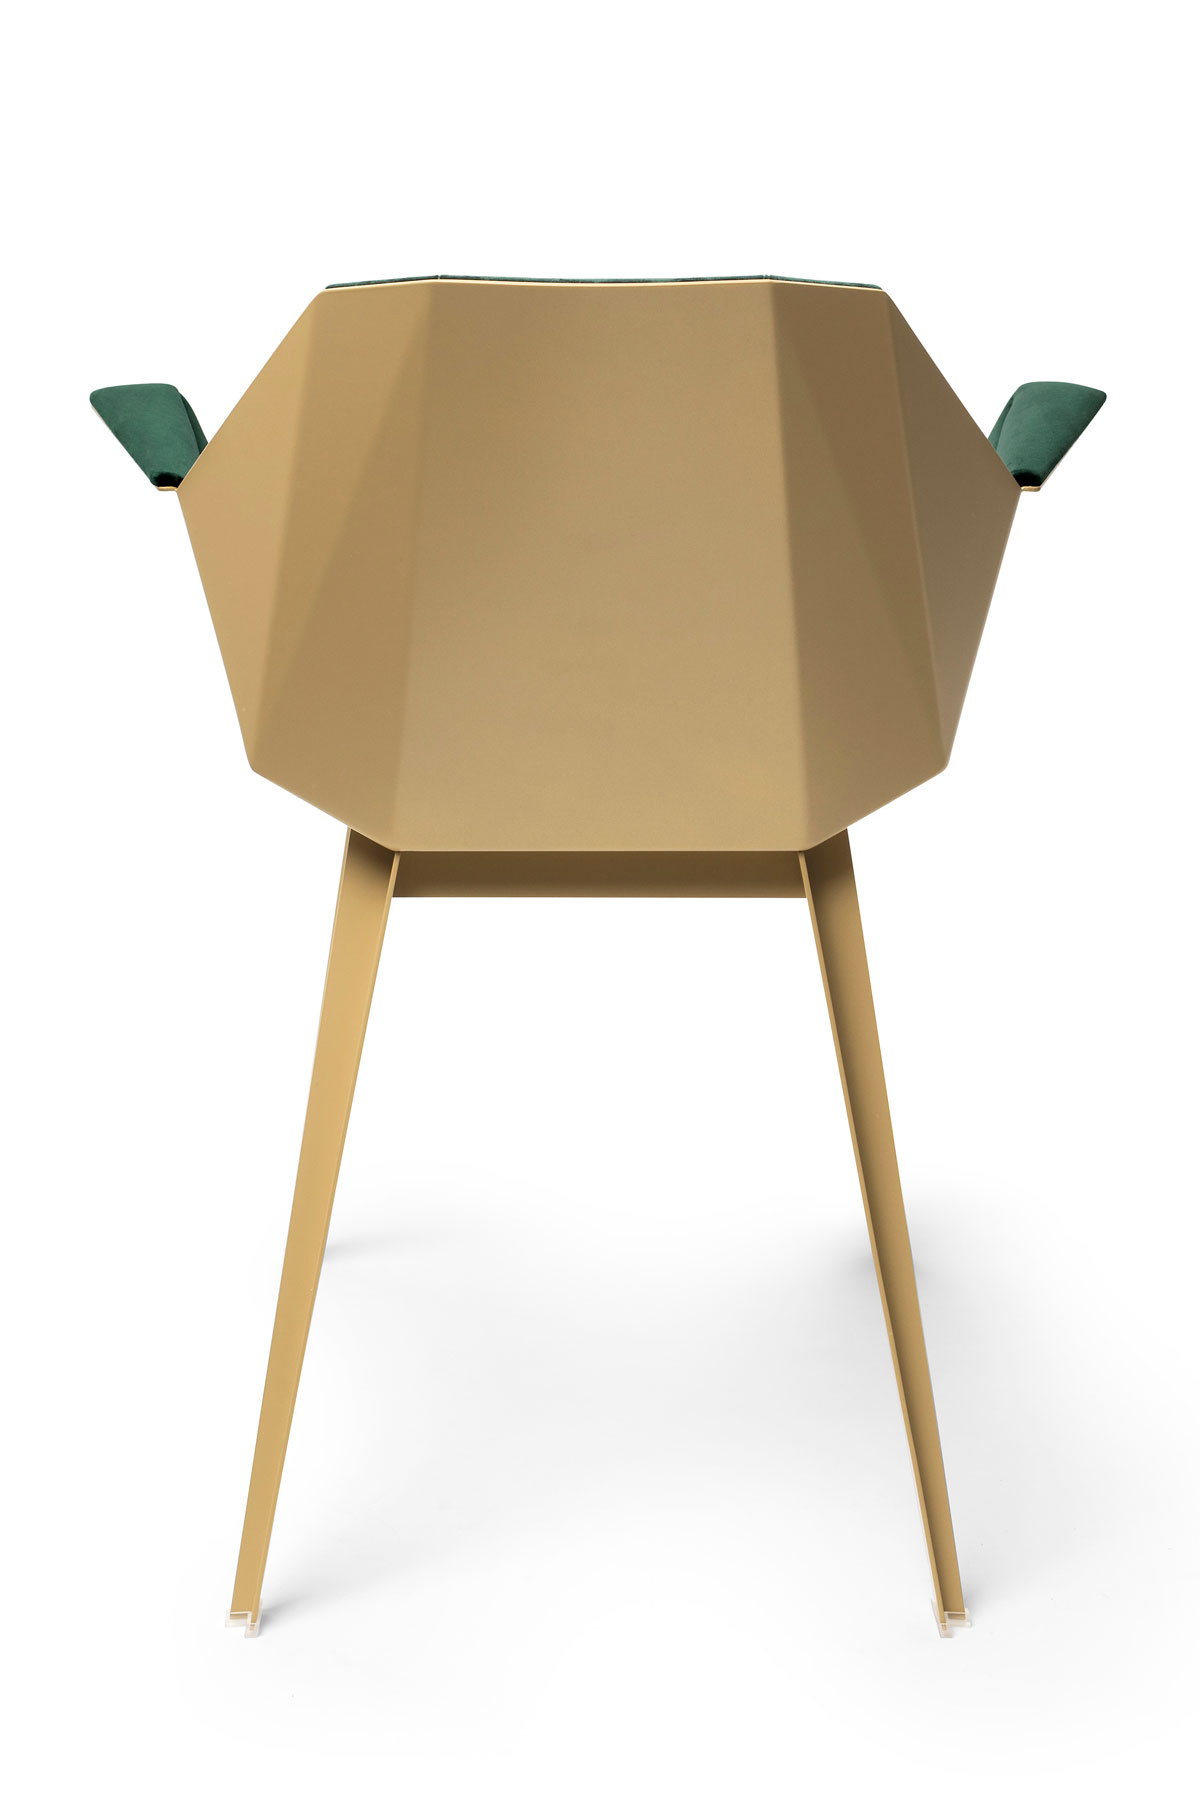 Alumni-Grace-gold-deep-green-upholstered_back.jpg